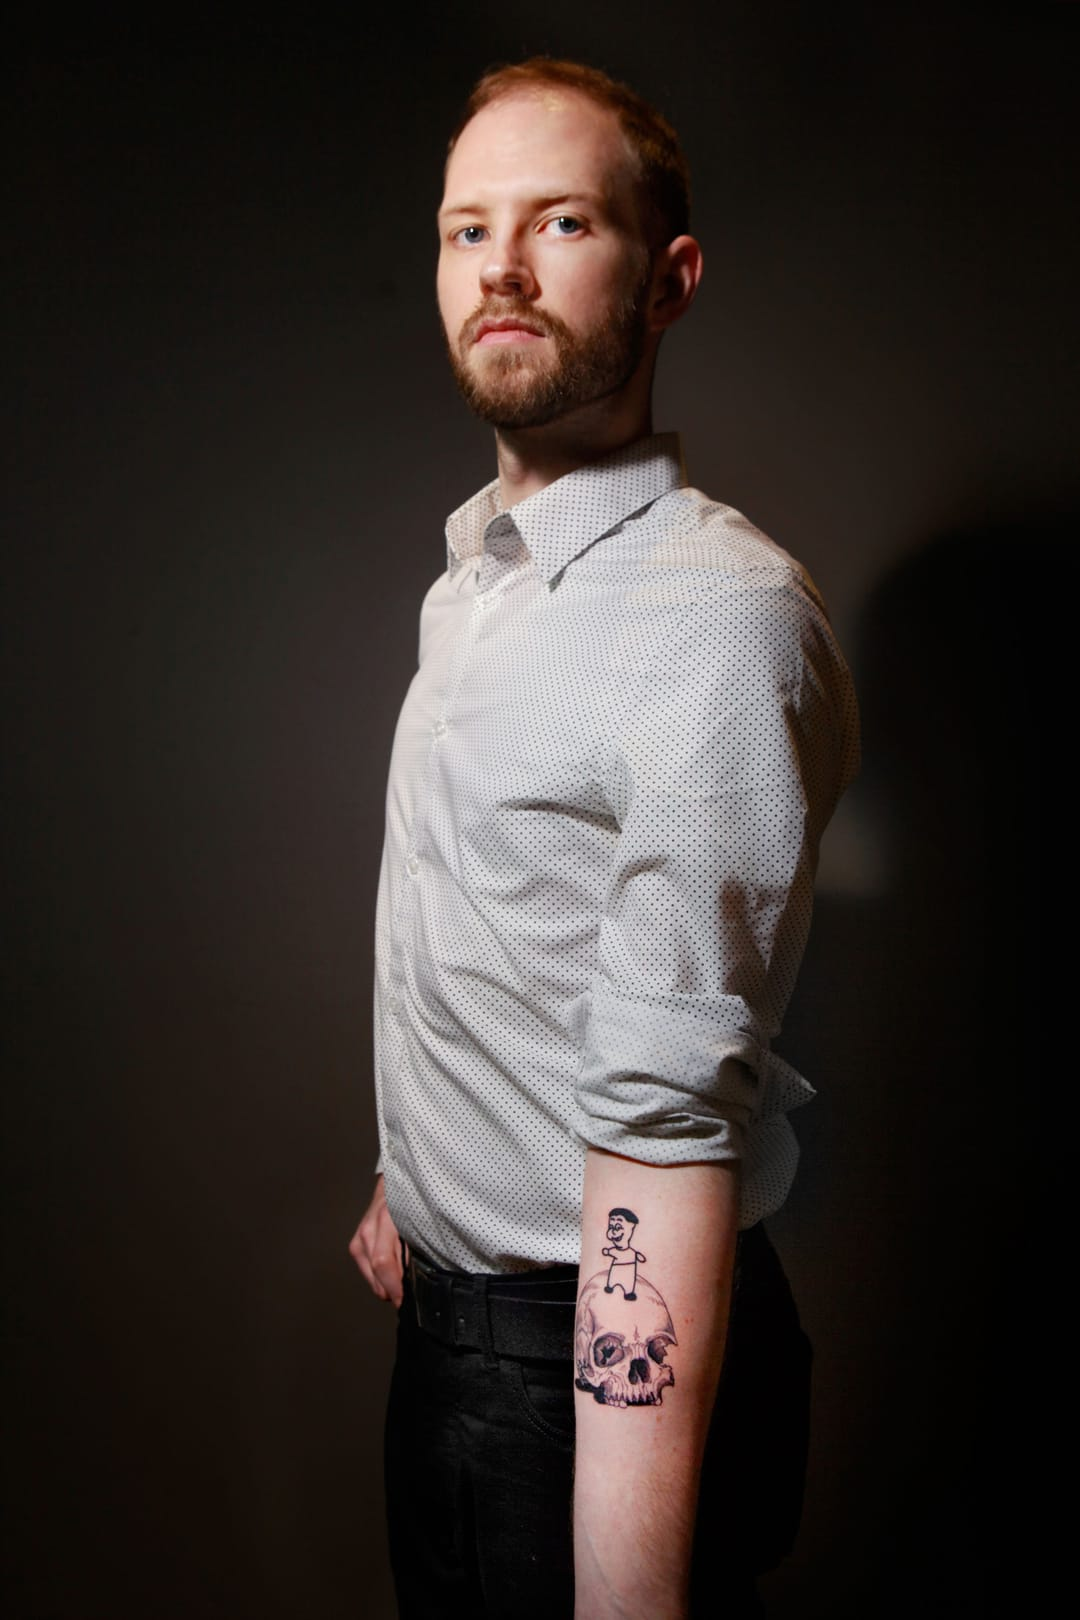 Ian Milliken, photo by Marisha Camp